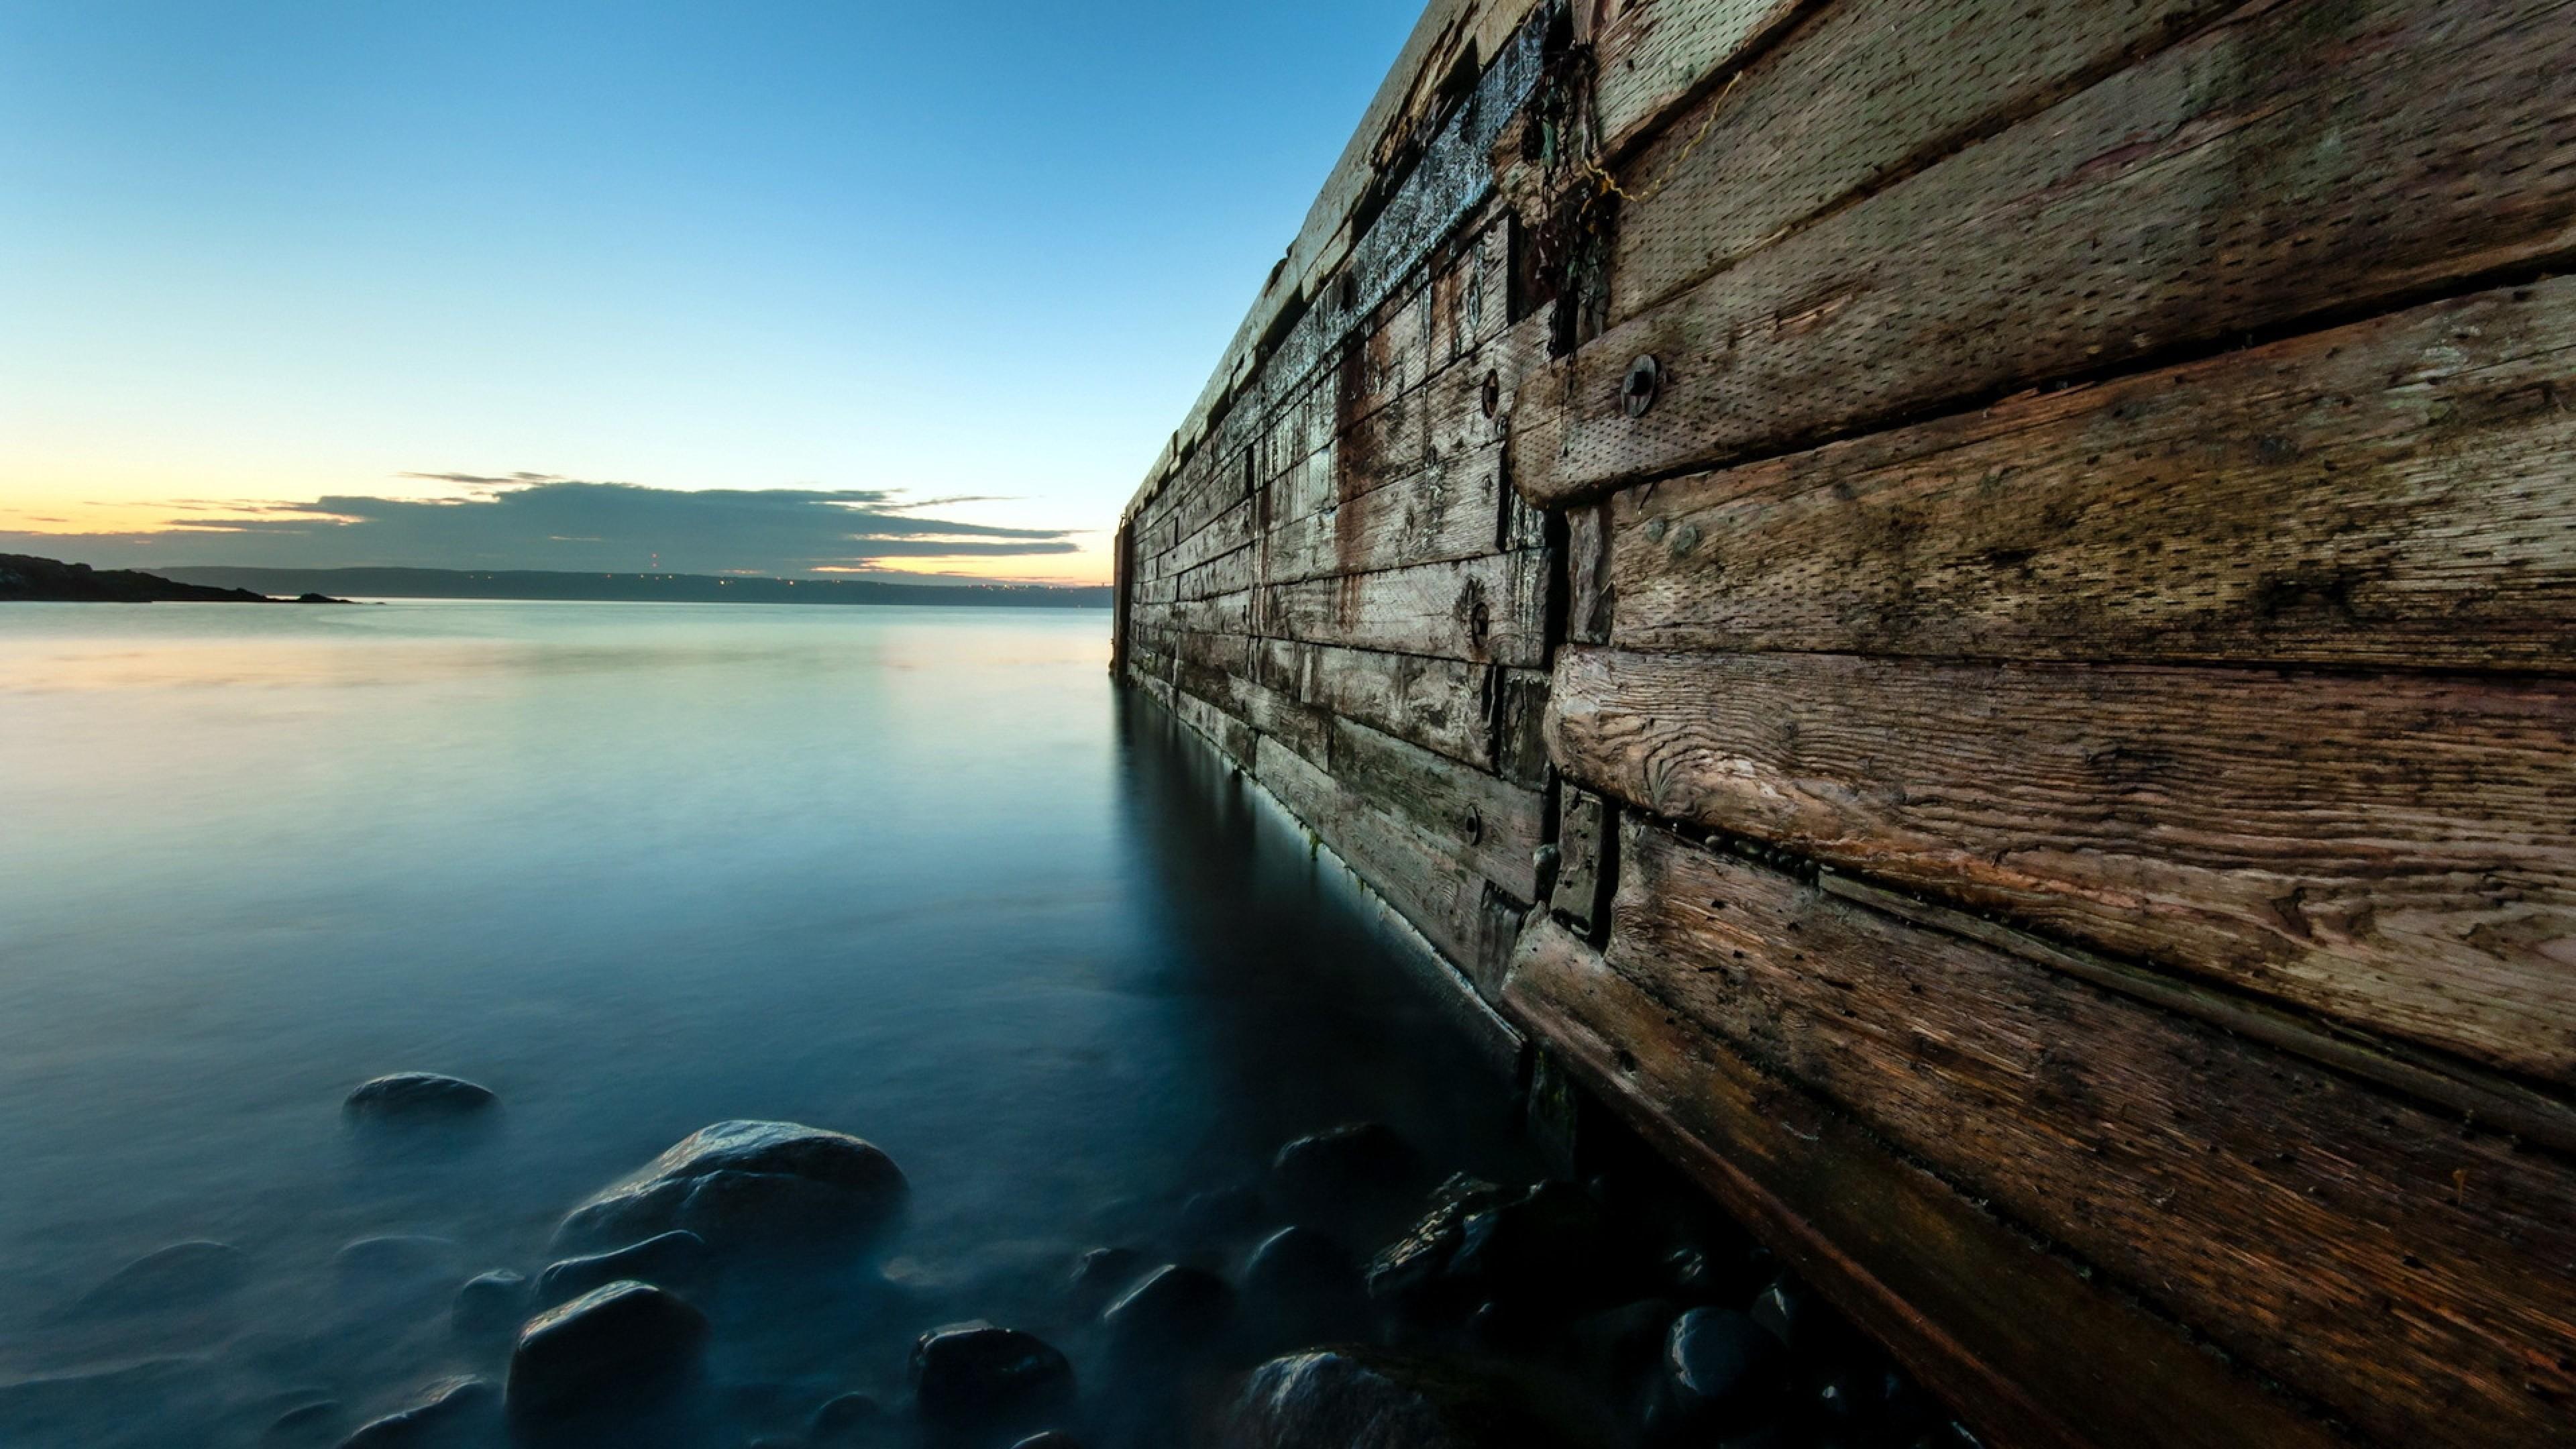 4K Wallpaper Landscape ·① Download Free Cool Full HD